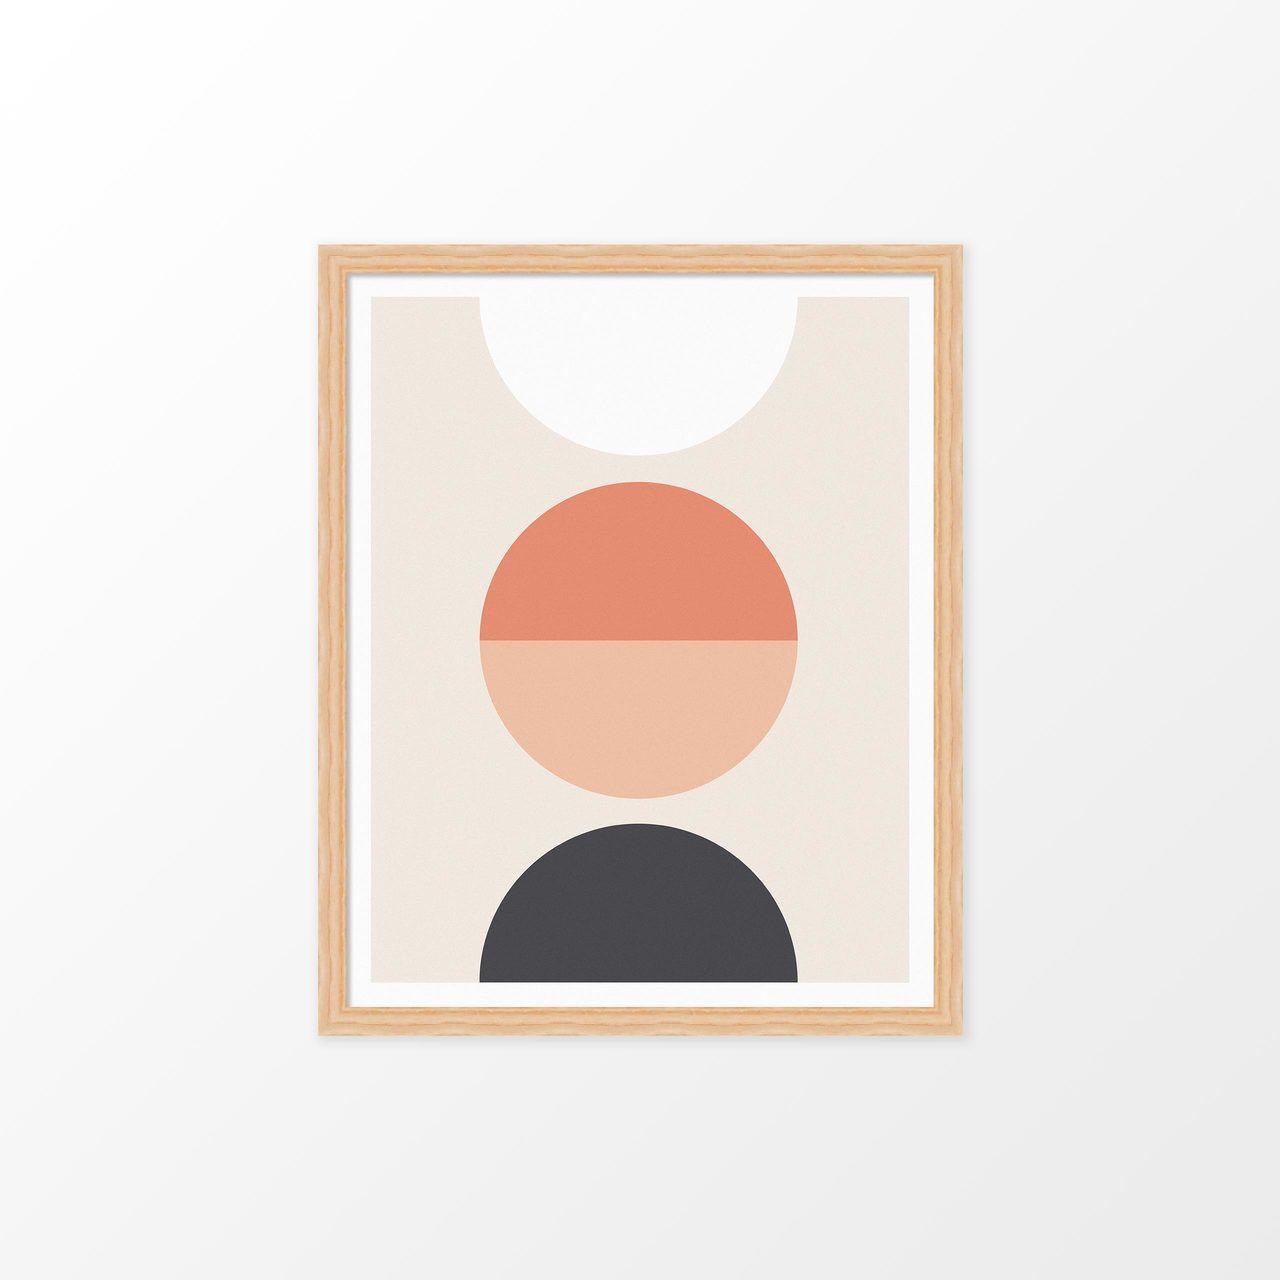 'Luna' Geometric Digital Art Print from The Printed Home